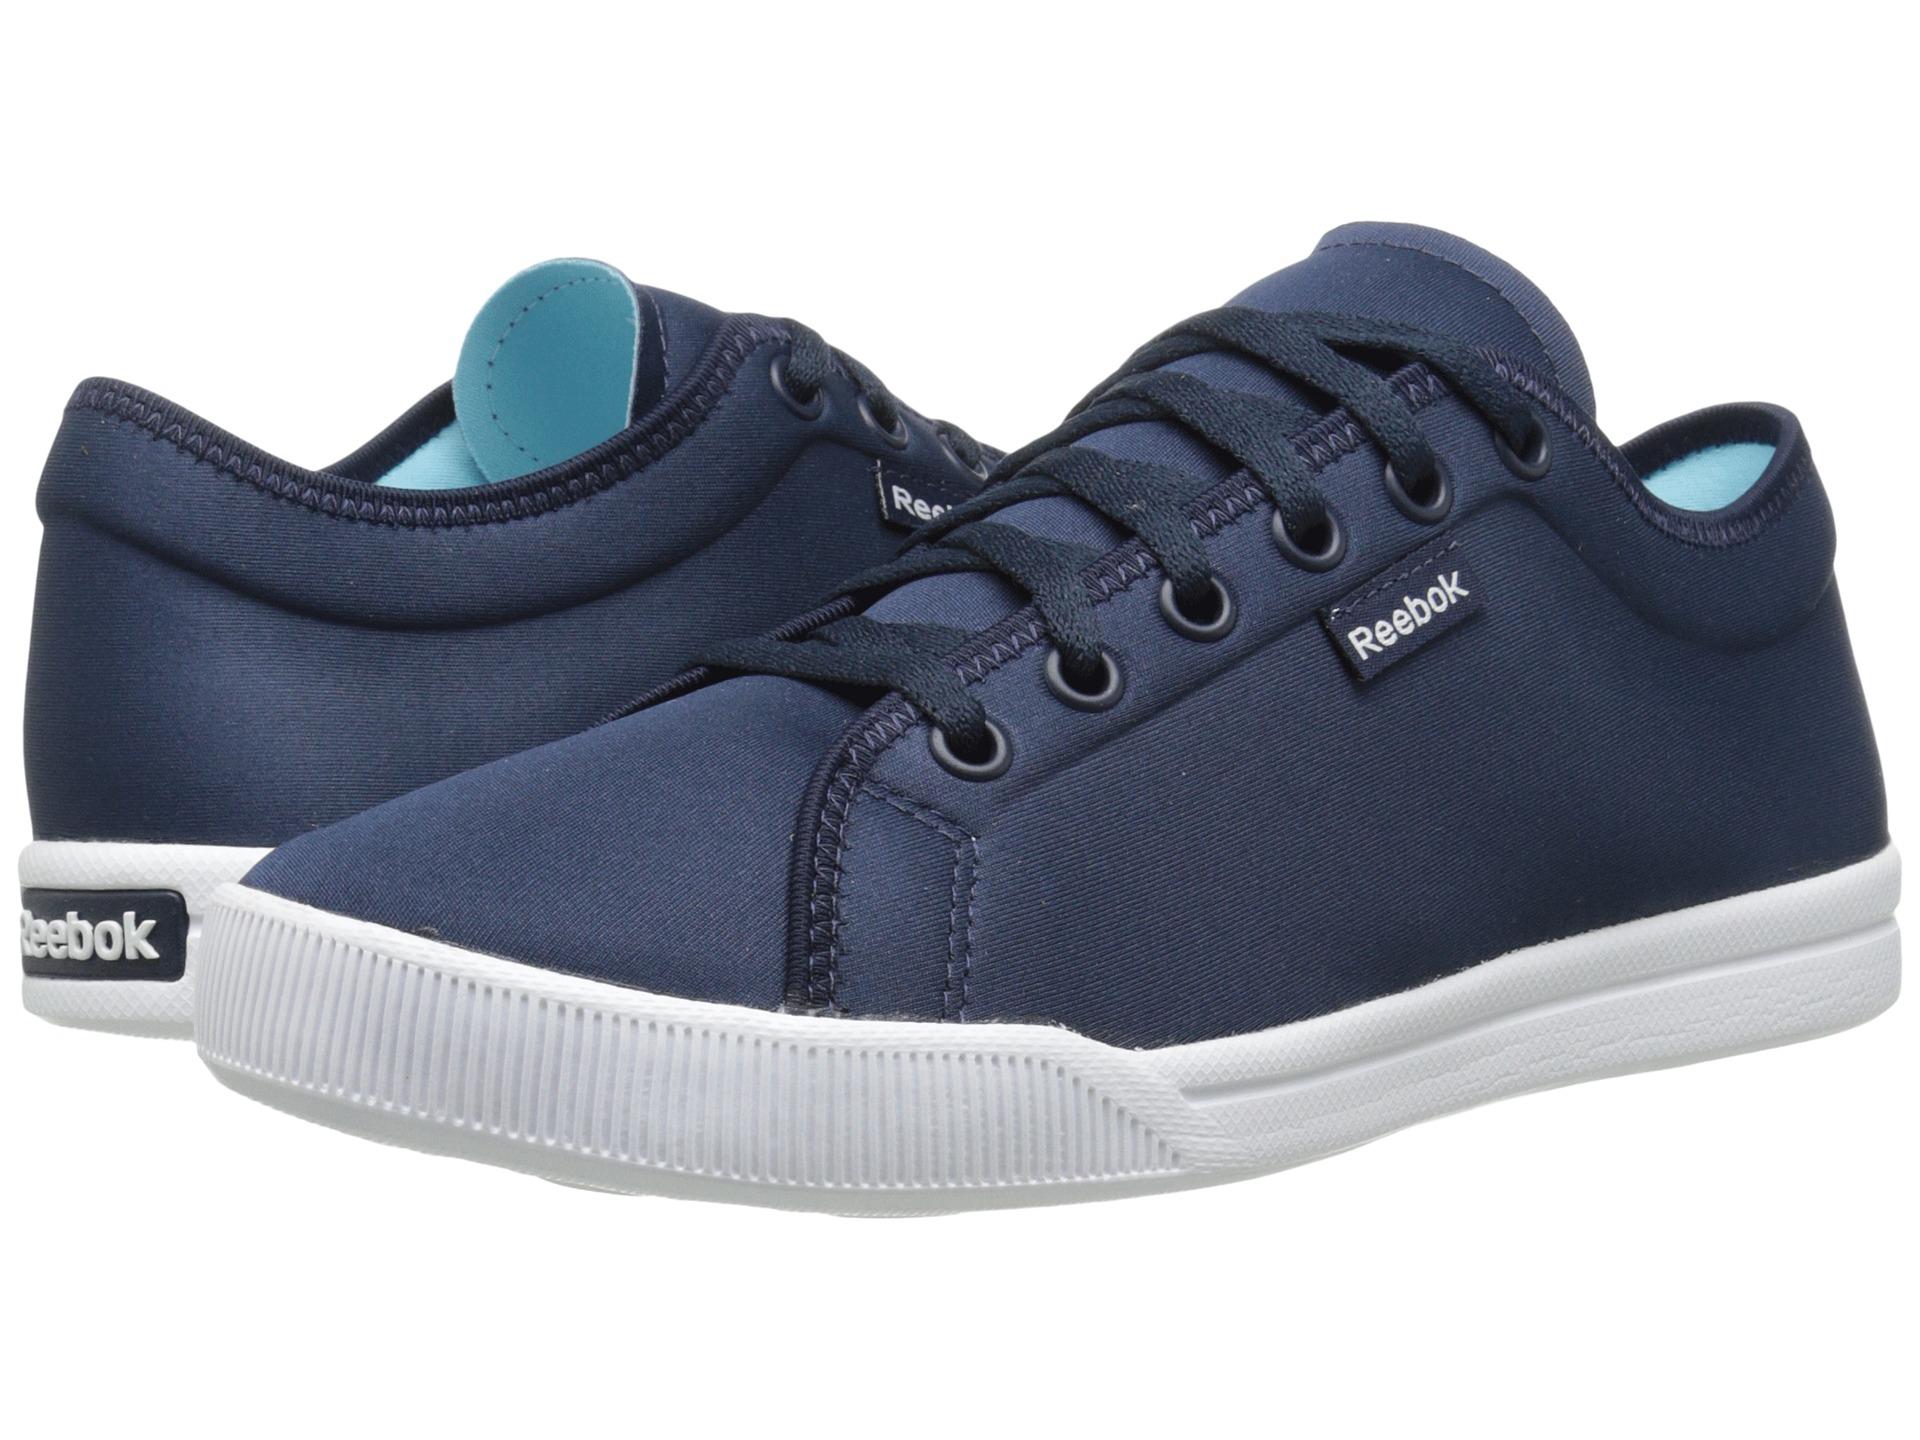 Reebok Skyscape Runaround Shoes